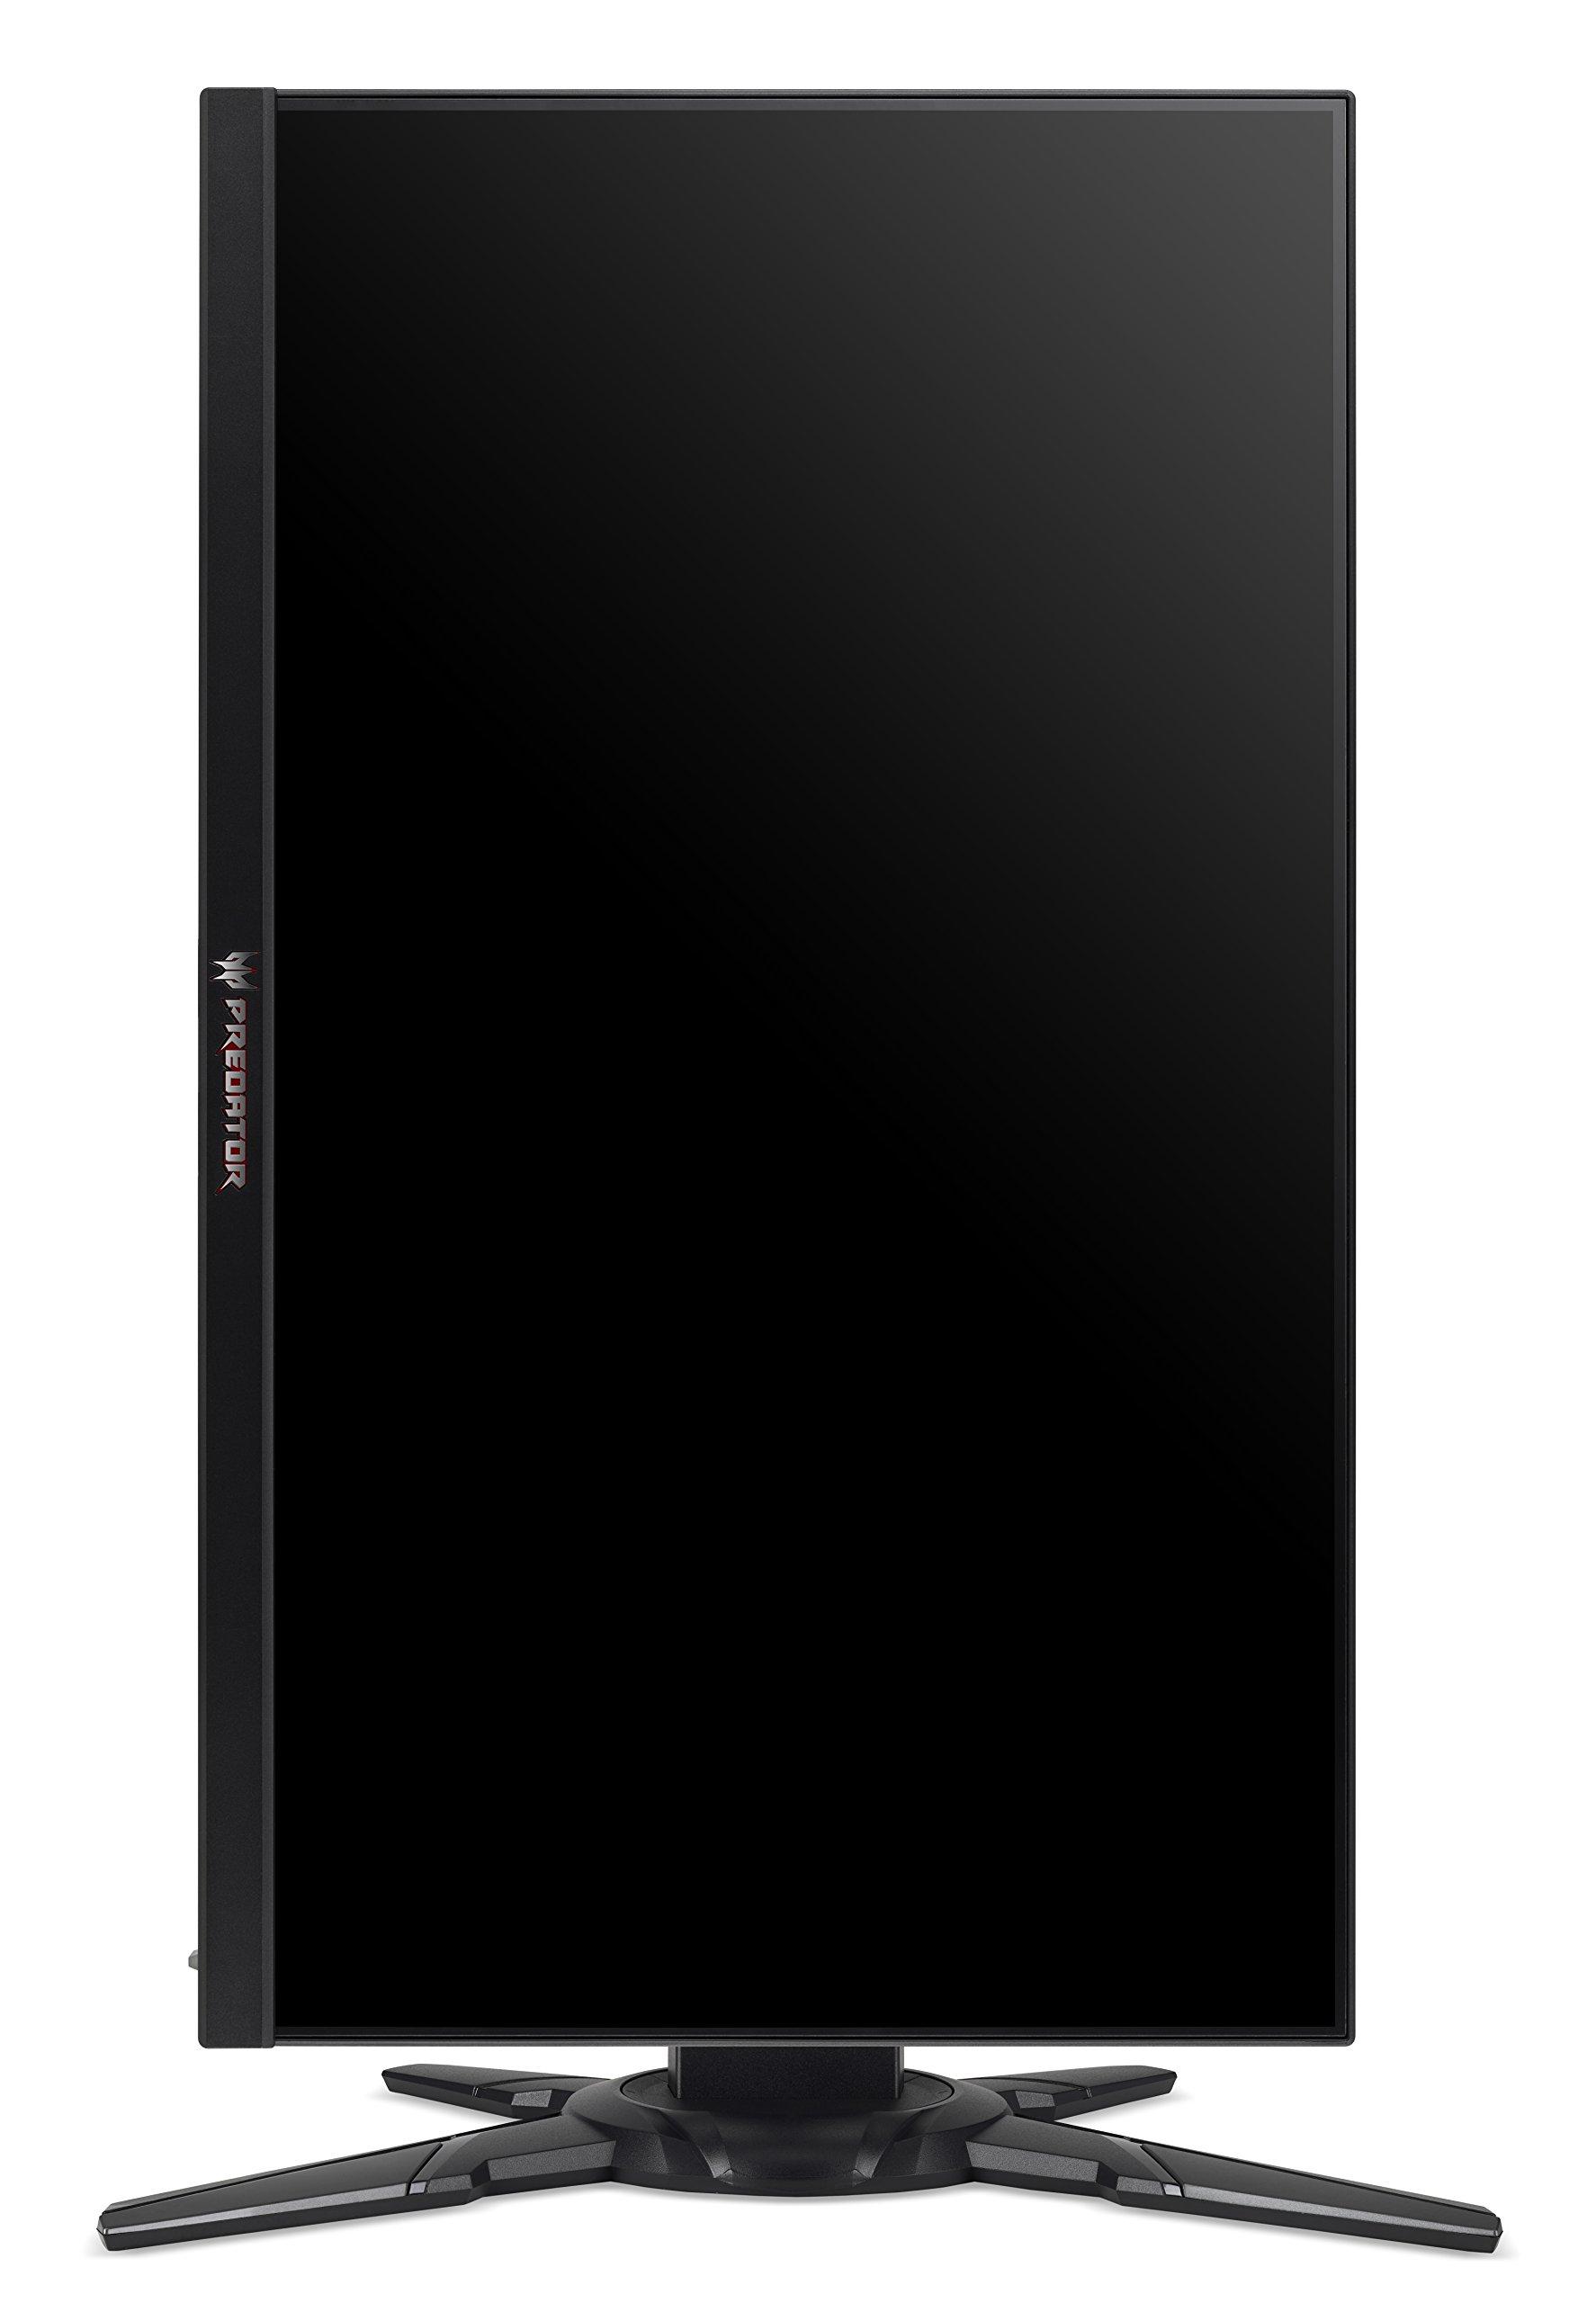 Renewed Acer Predator XB2 27in Gaming Monitor NVIDIA G-SYNC 240 Hz Full HD 1 ms TN Film XB272 bmiprz